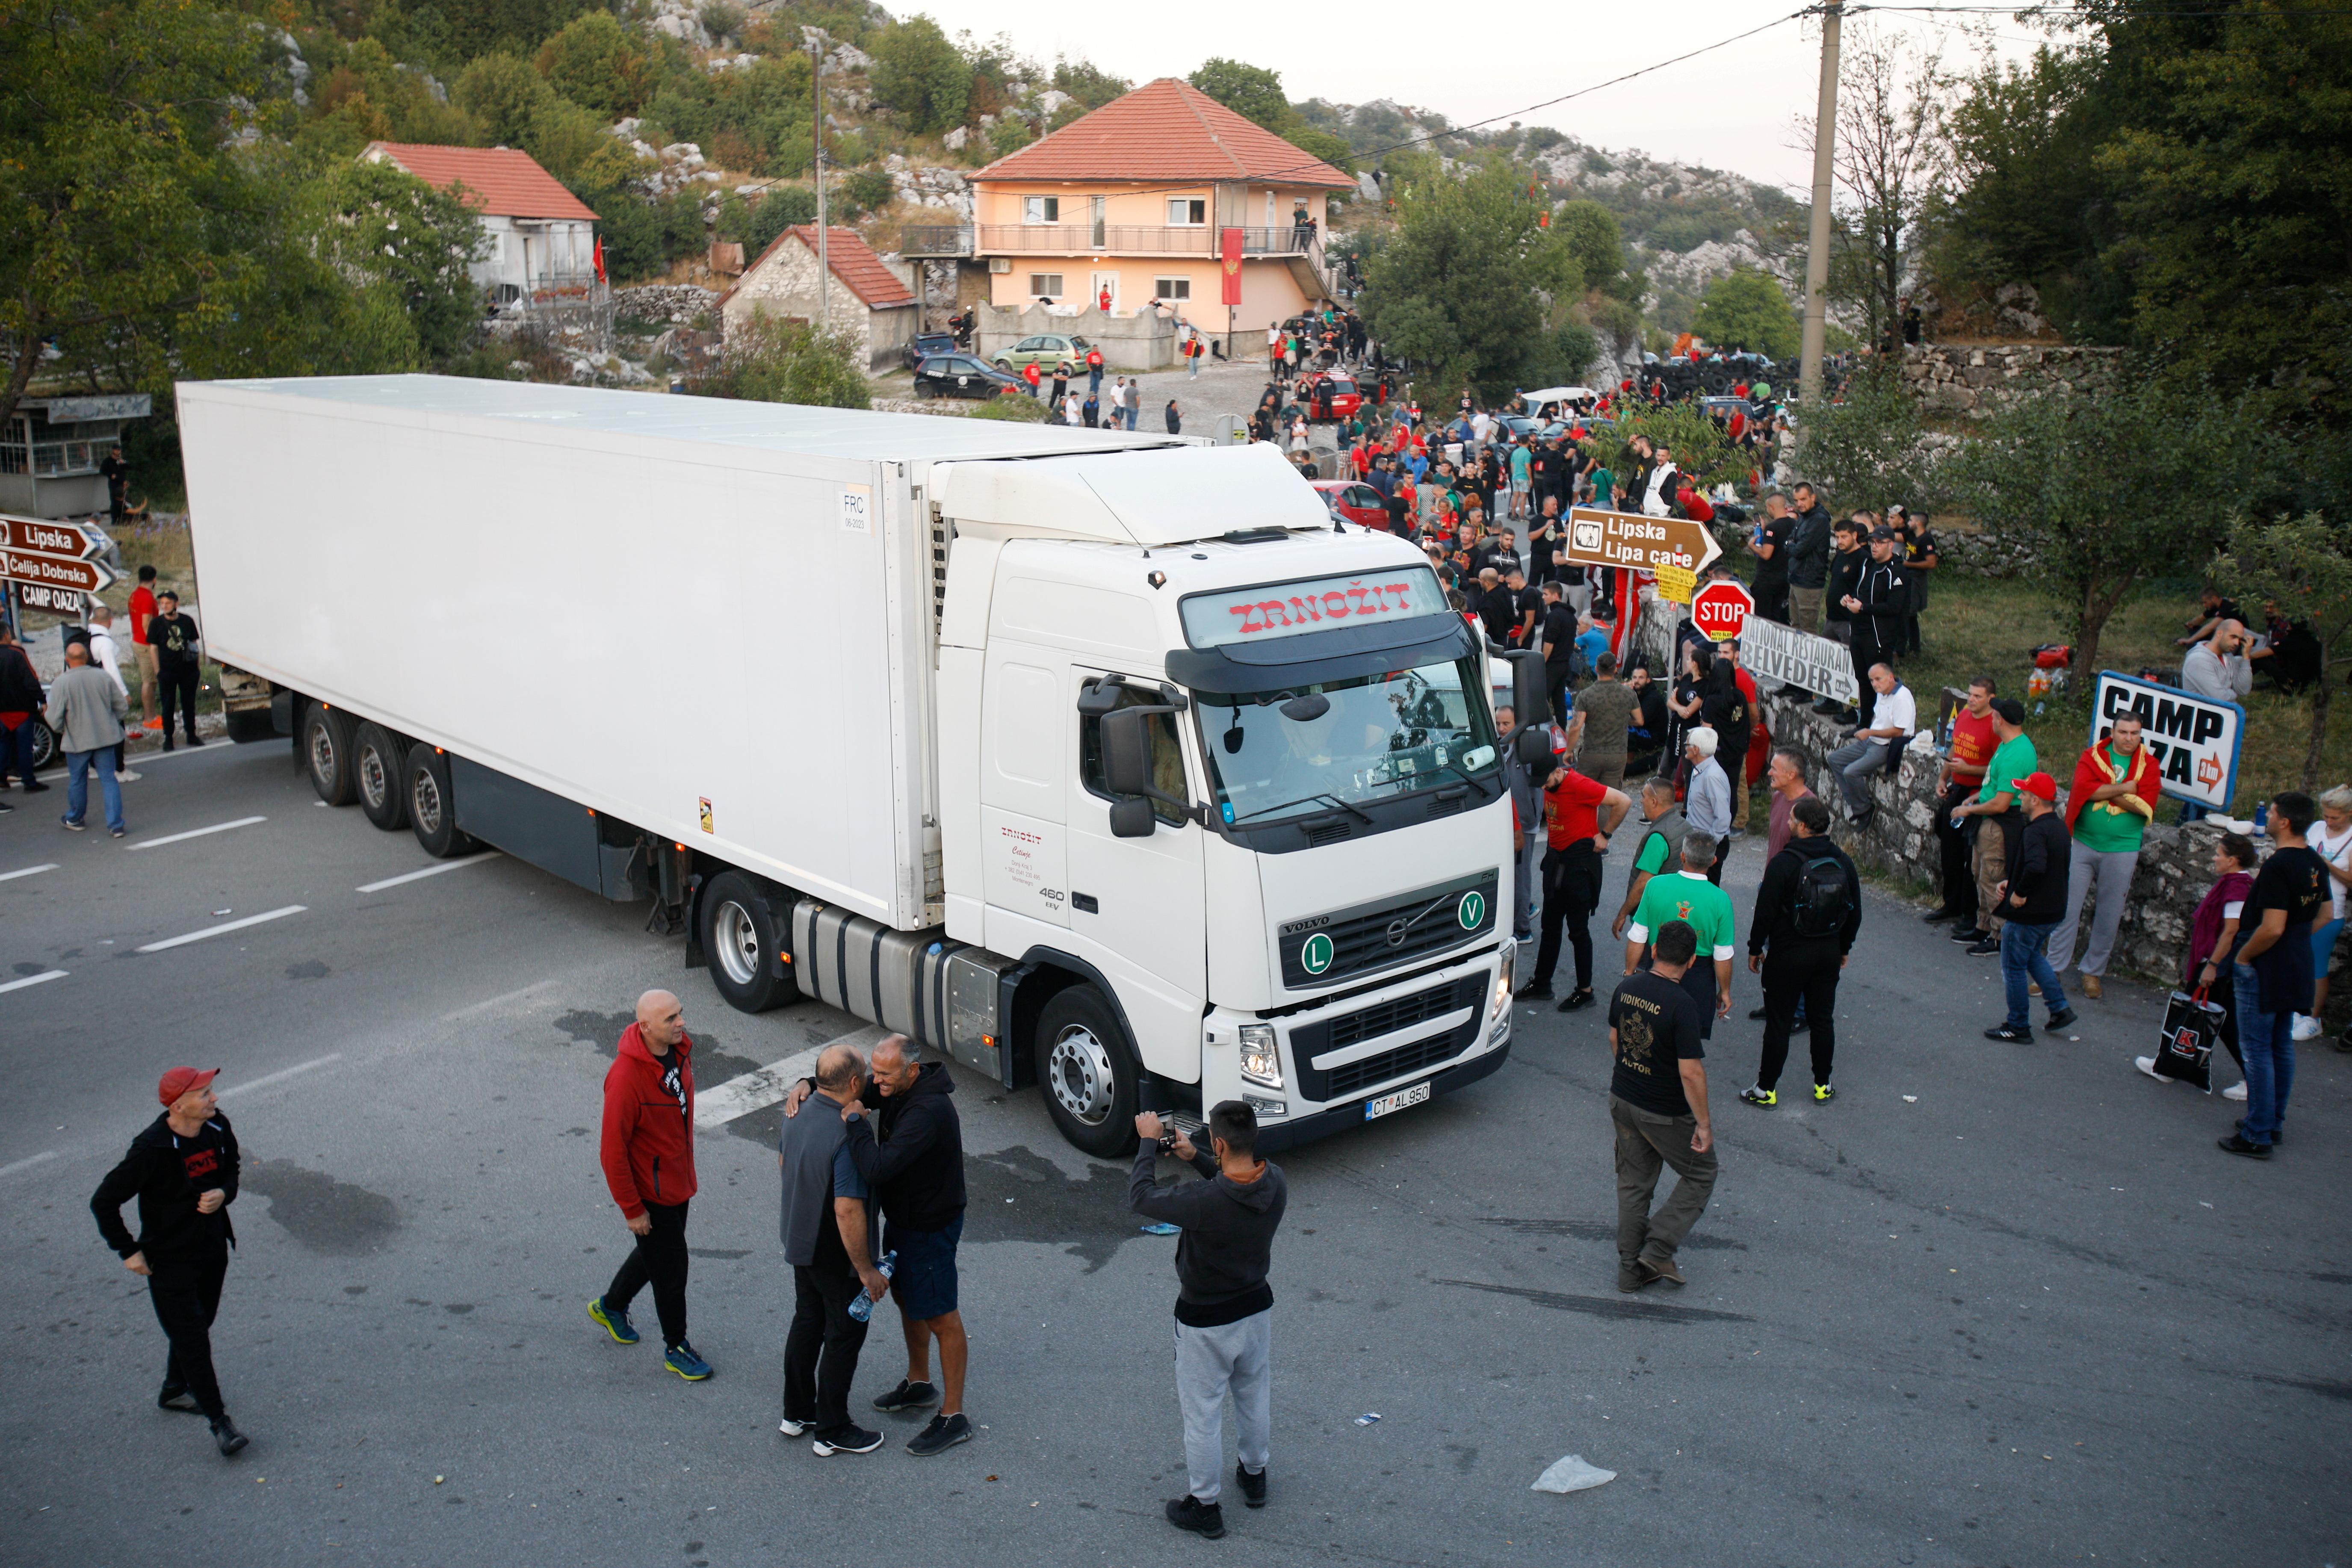 A truck arrives at a blockage of demonstrators during a protest against the enthronement of Bishop Joanikije in Cetinje, Montenegro, September 4, 2021. REUTERS/Stevo Vasiljevic